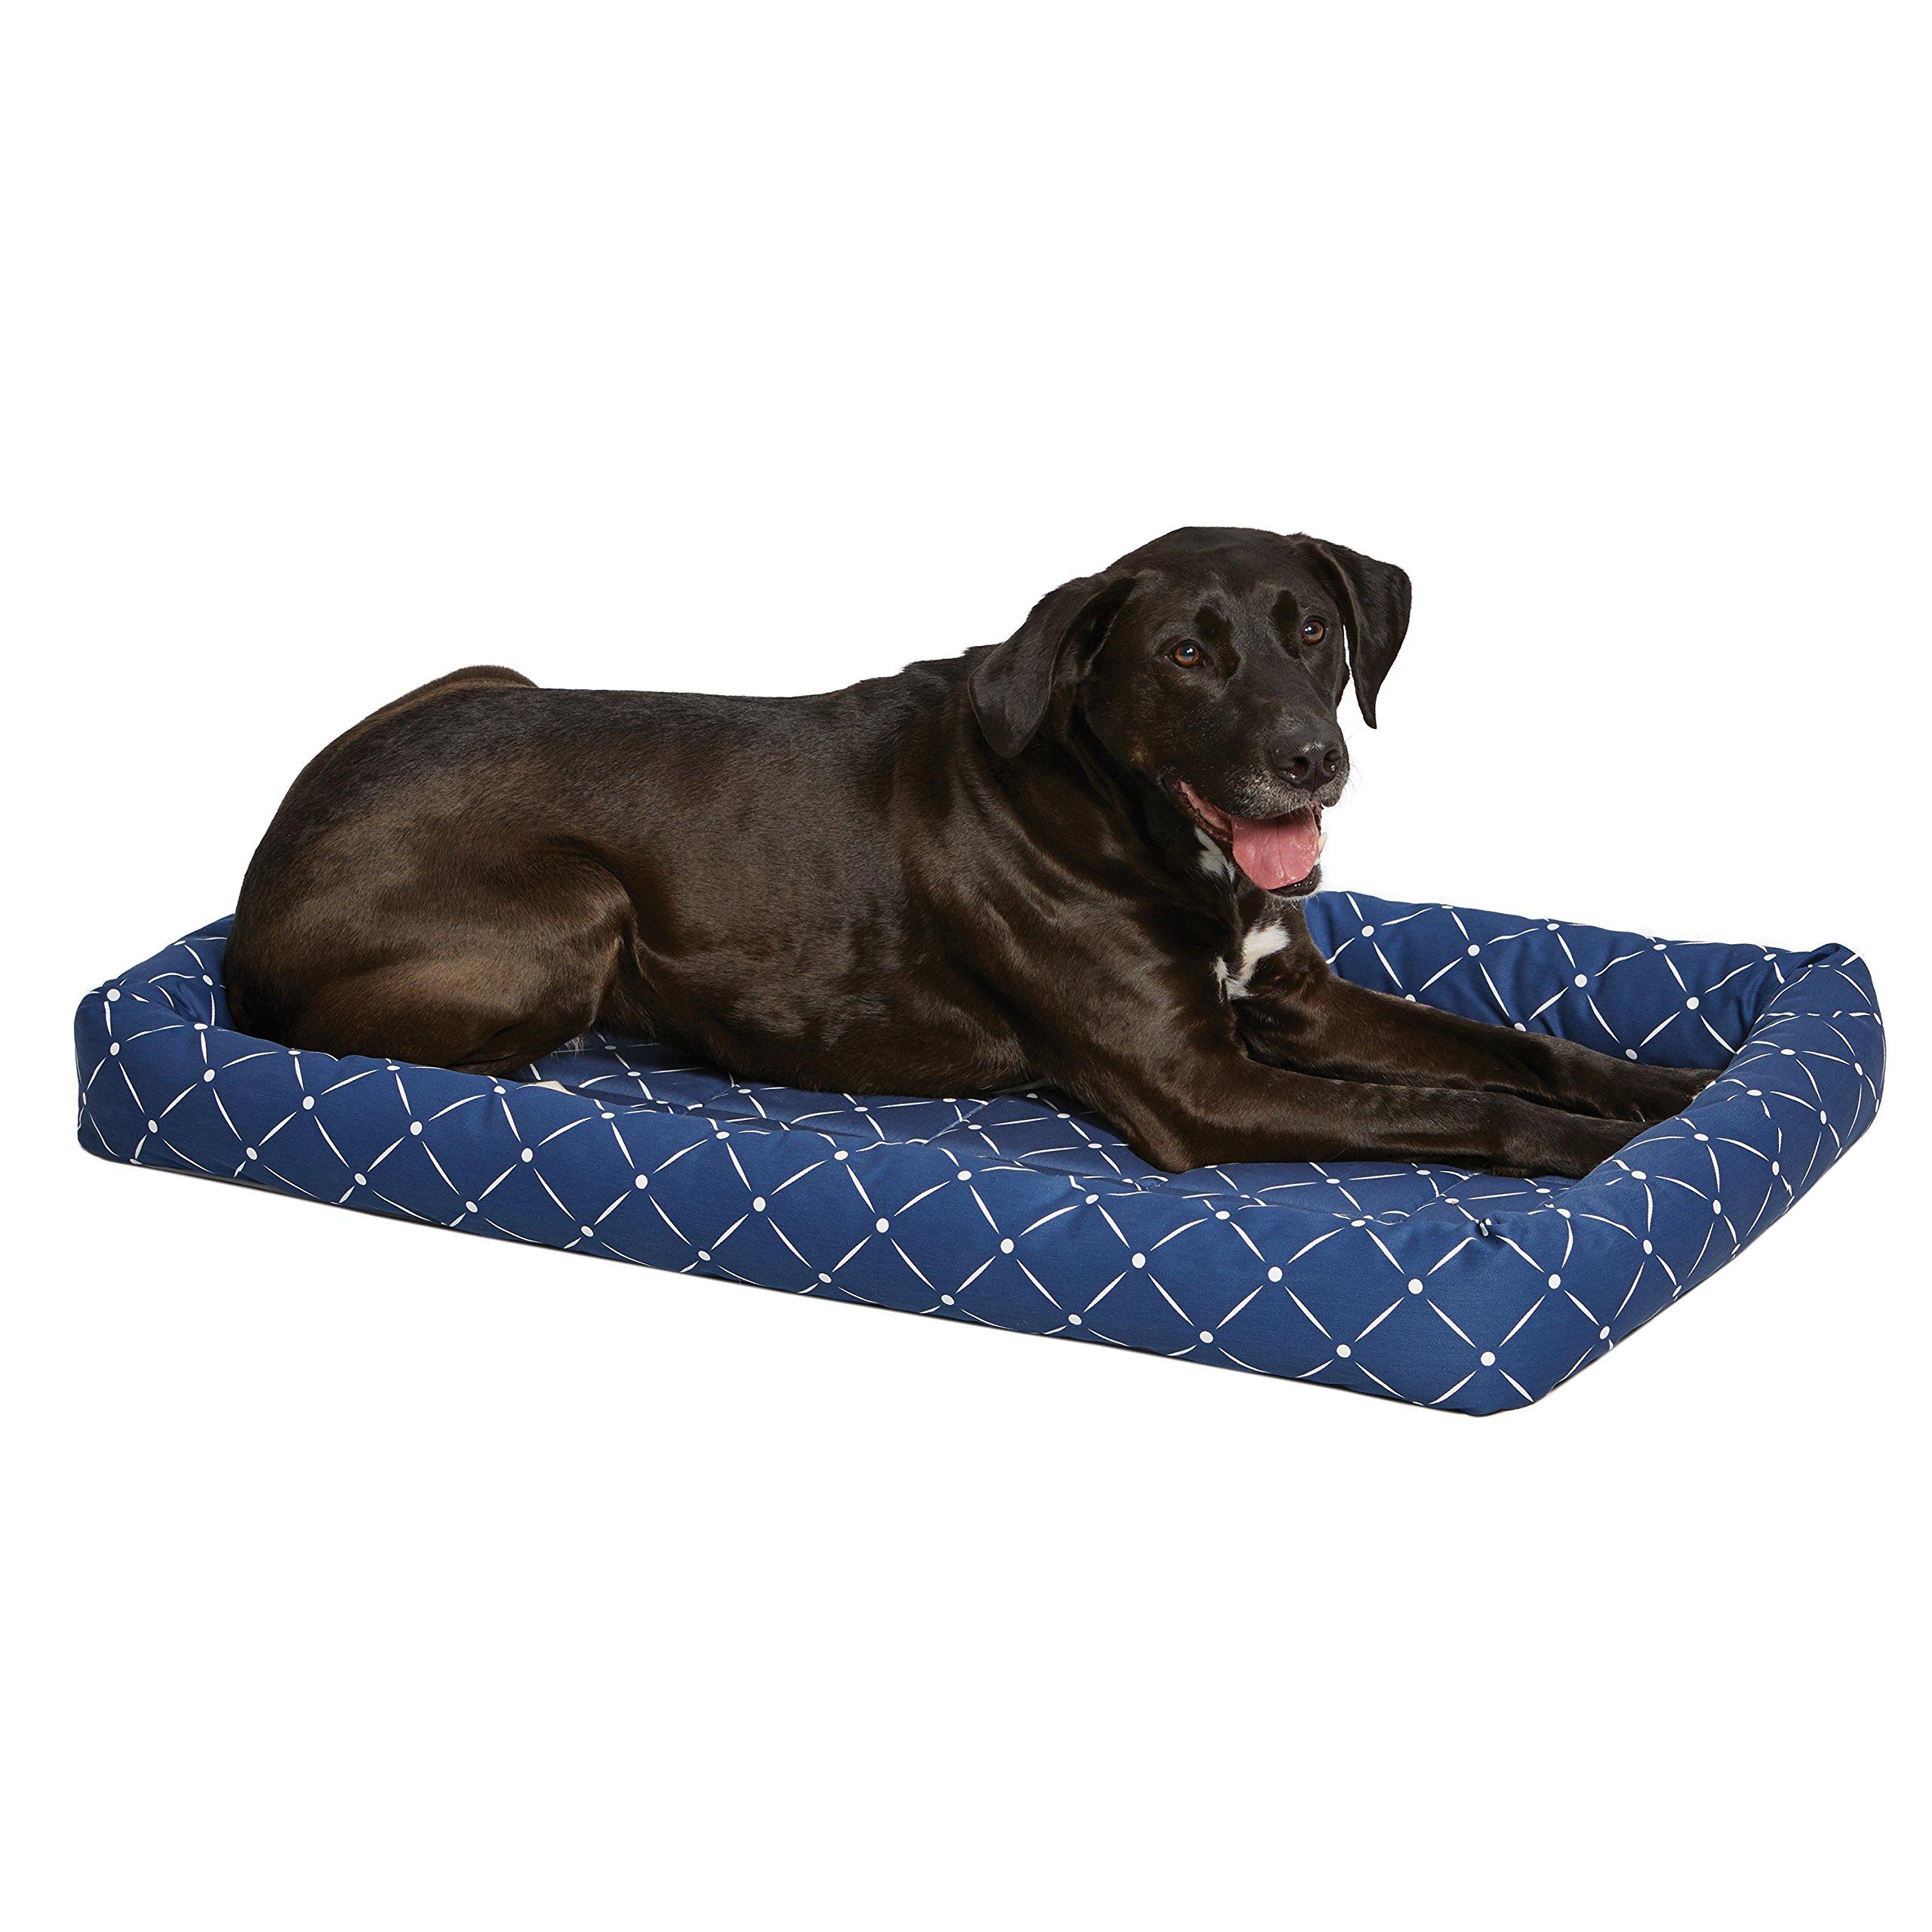 Dog Bed Designed to Fit  Folding Metal Dog Crates | Ashton Pet Bed Series